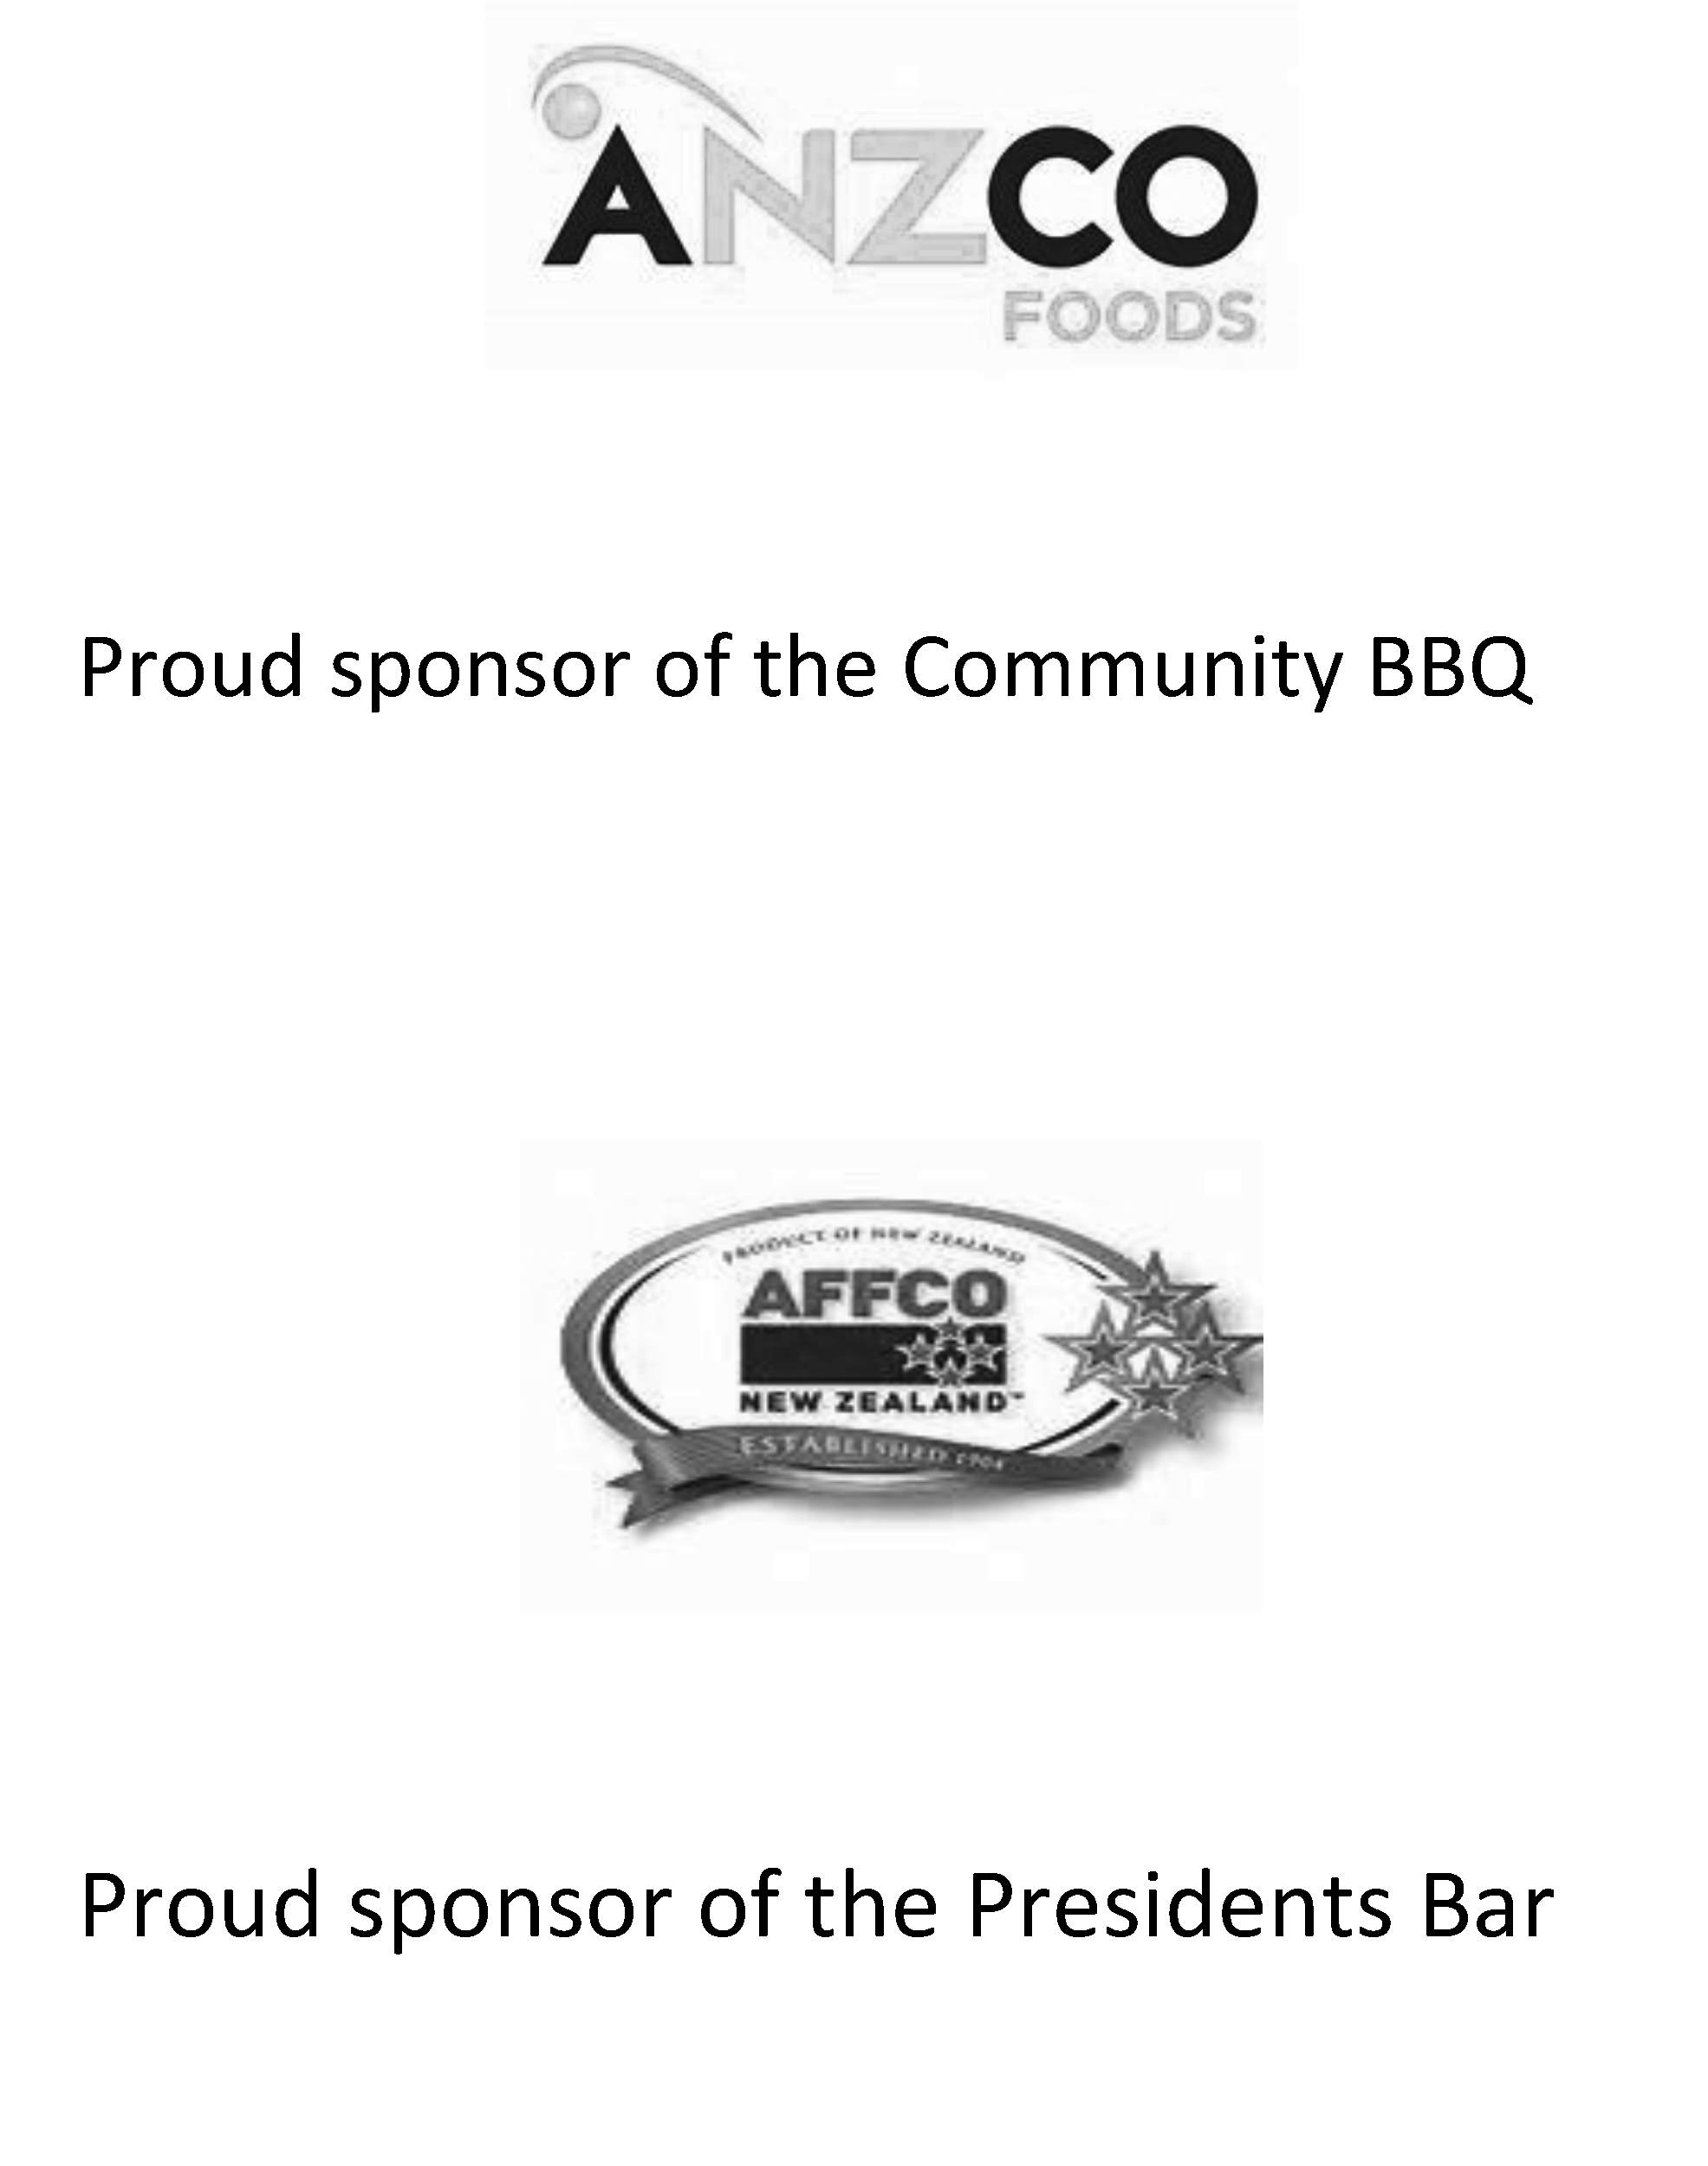 Proud sponsor of the Community BBQ